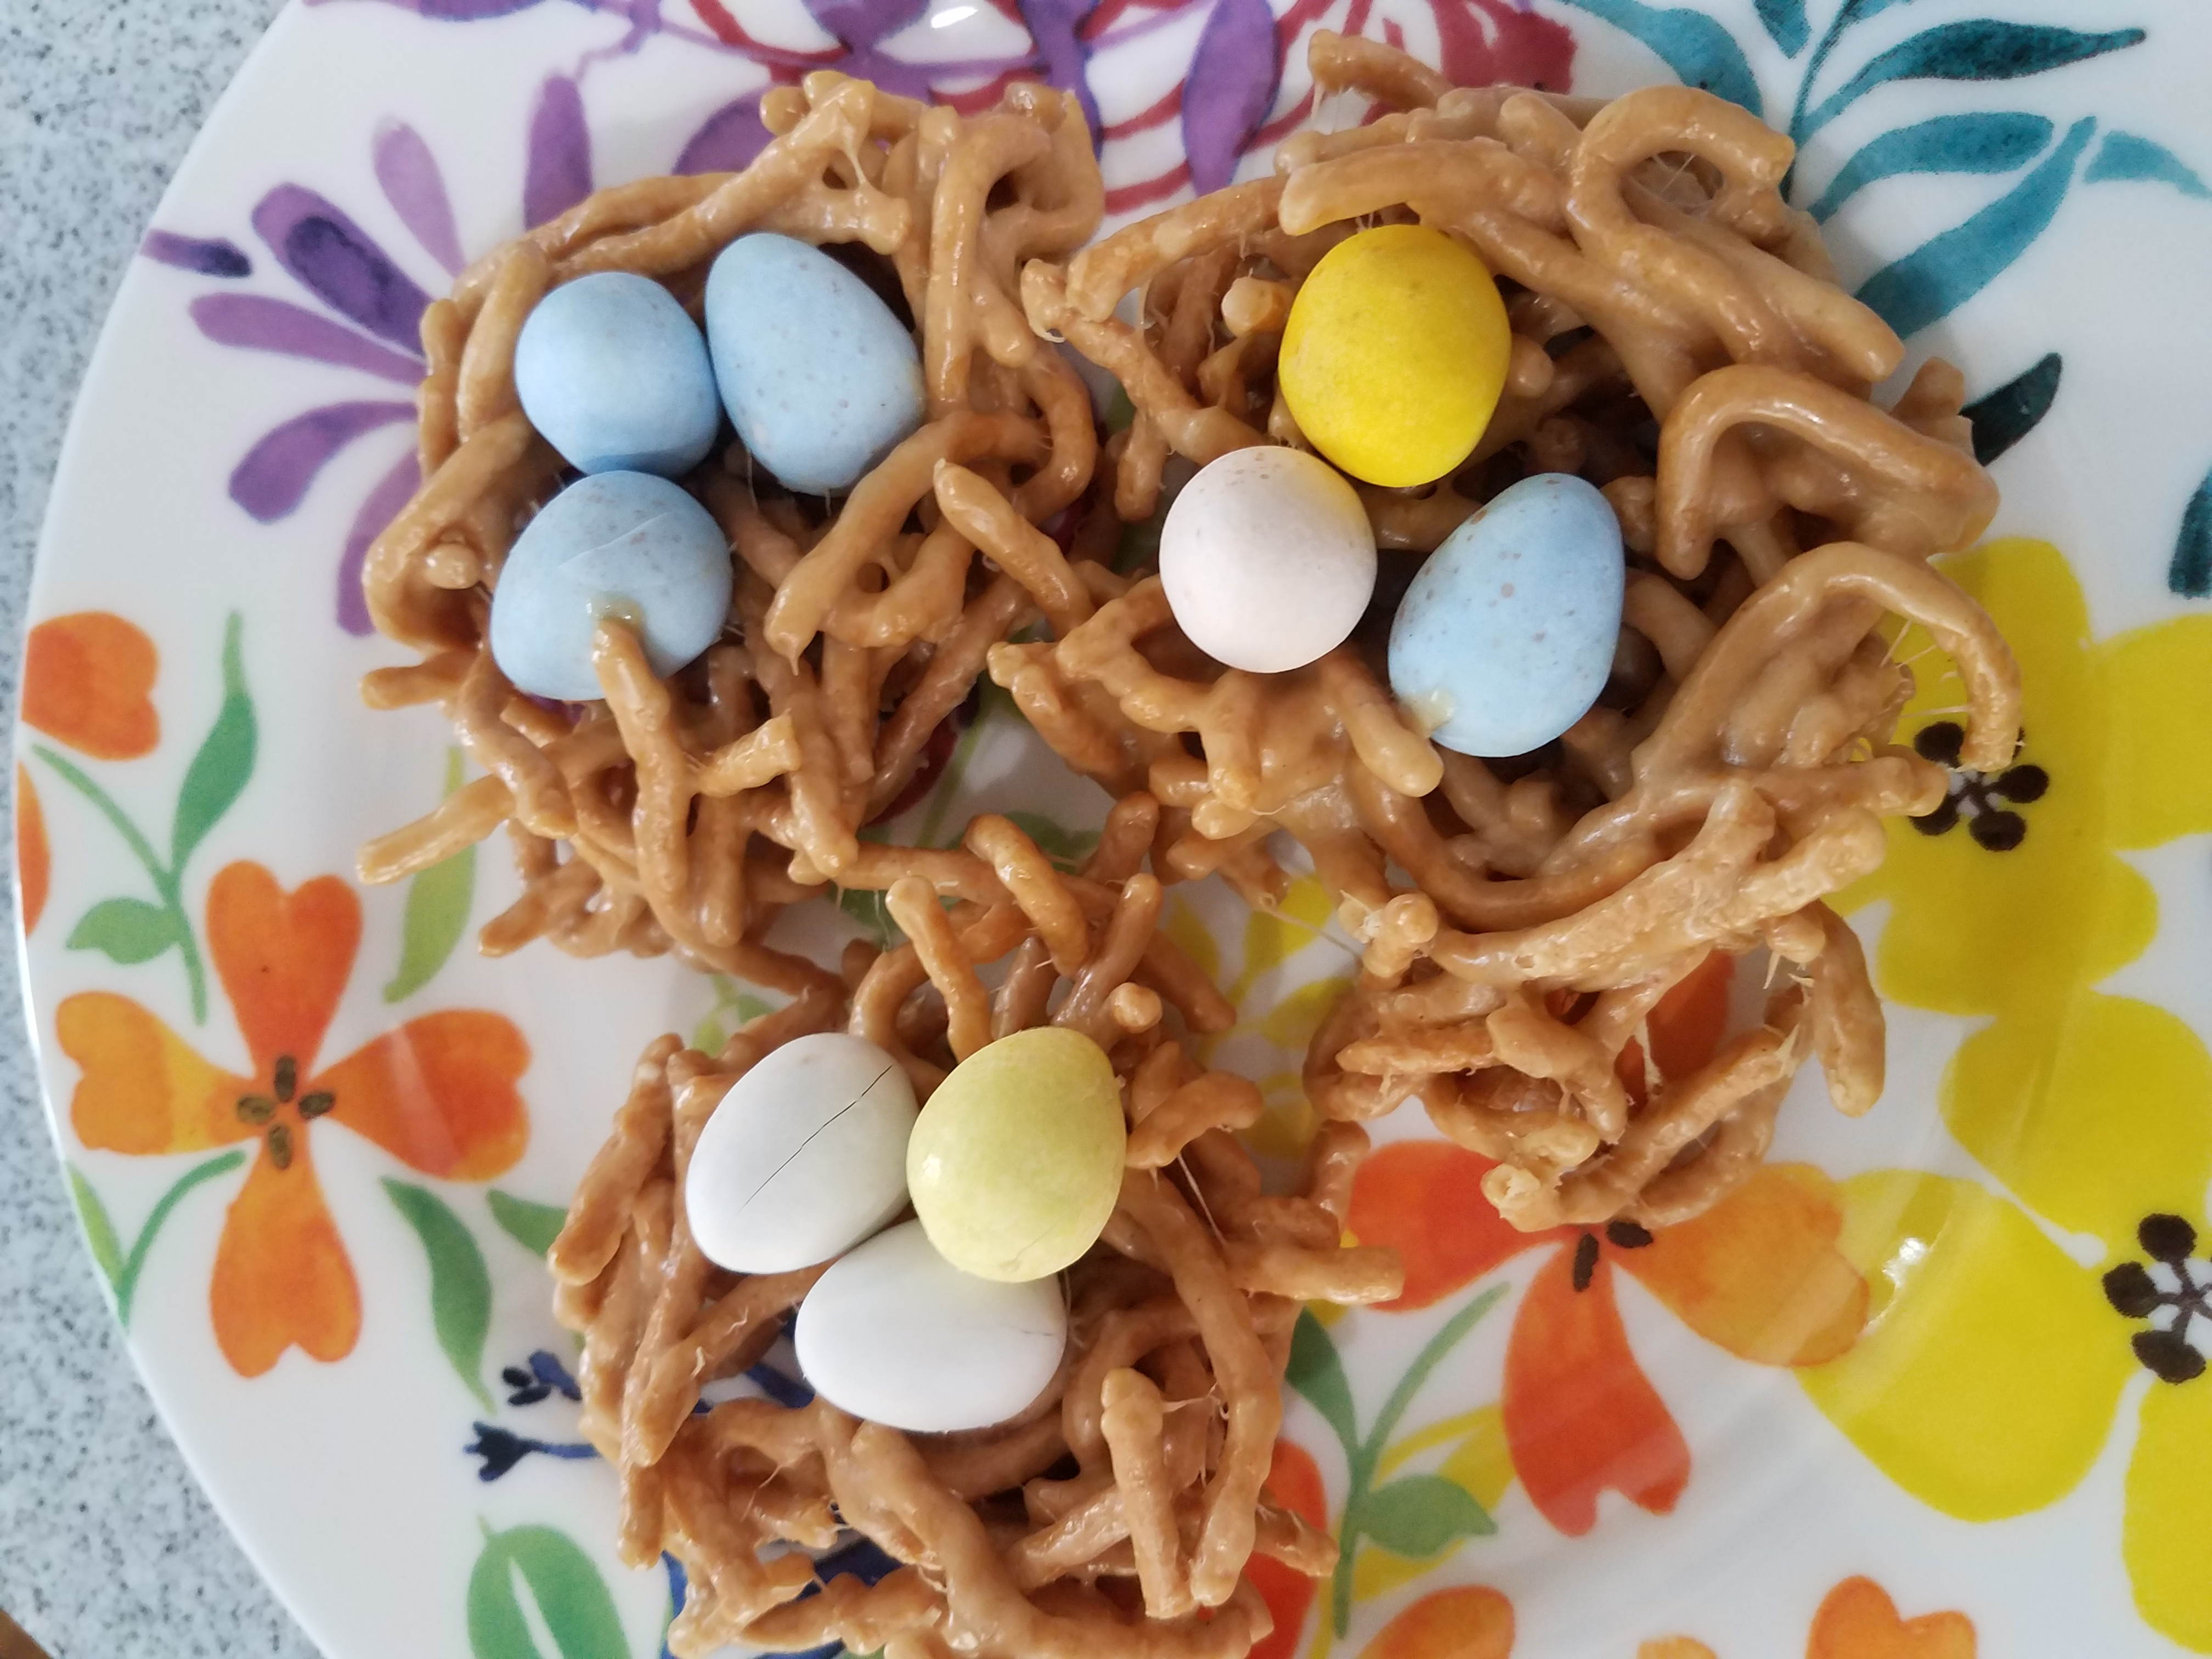 Easter Bird's Nests Dana Buinickas